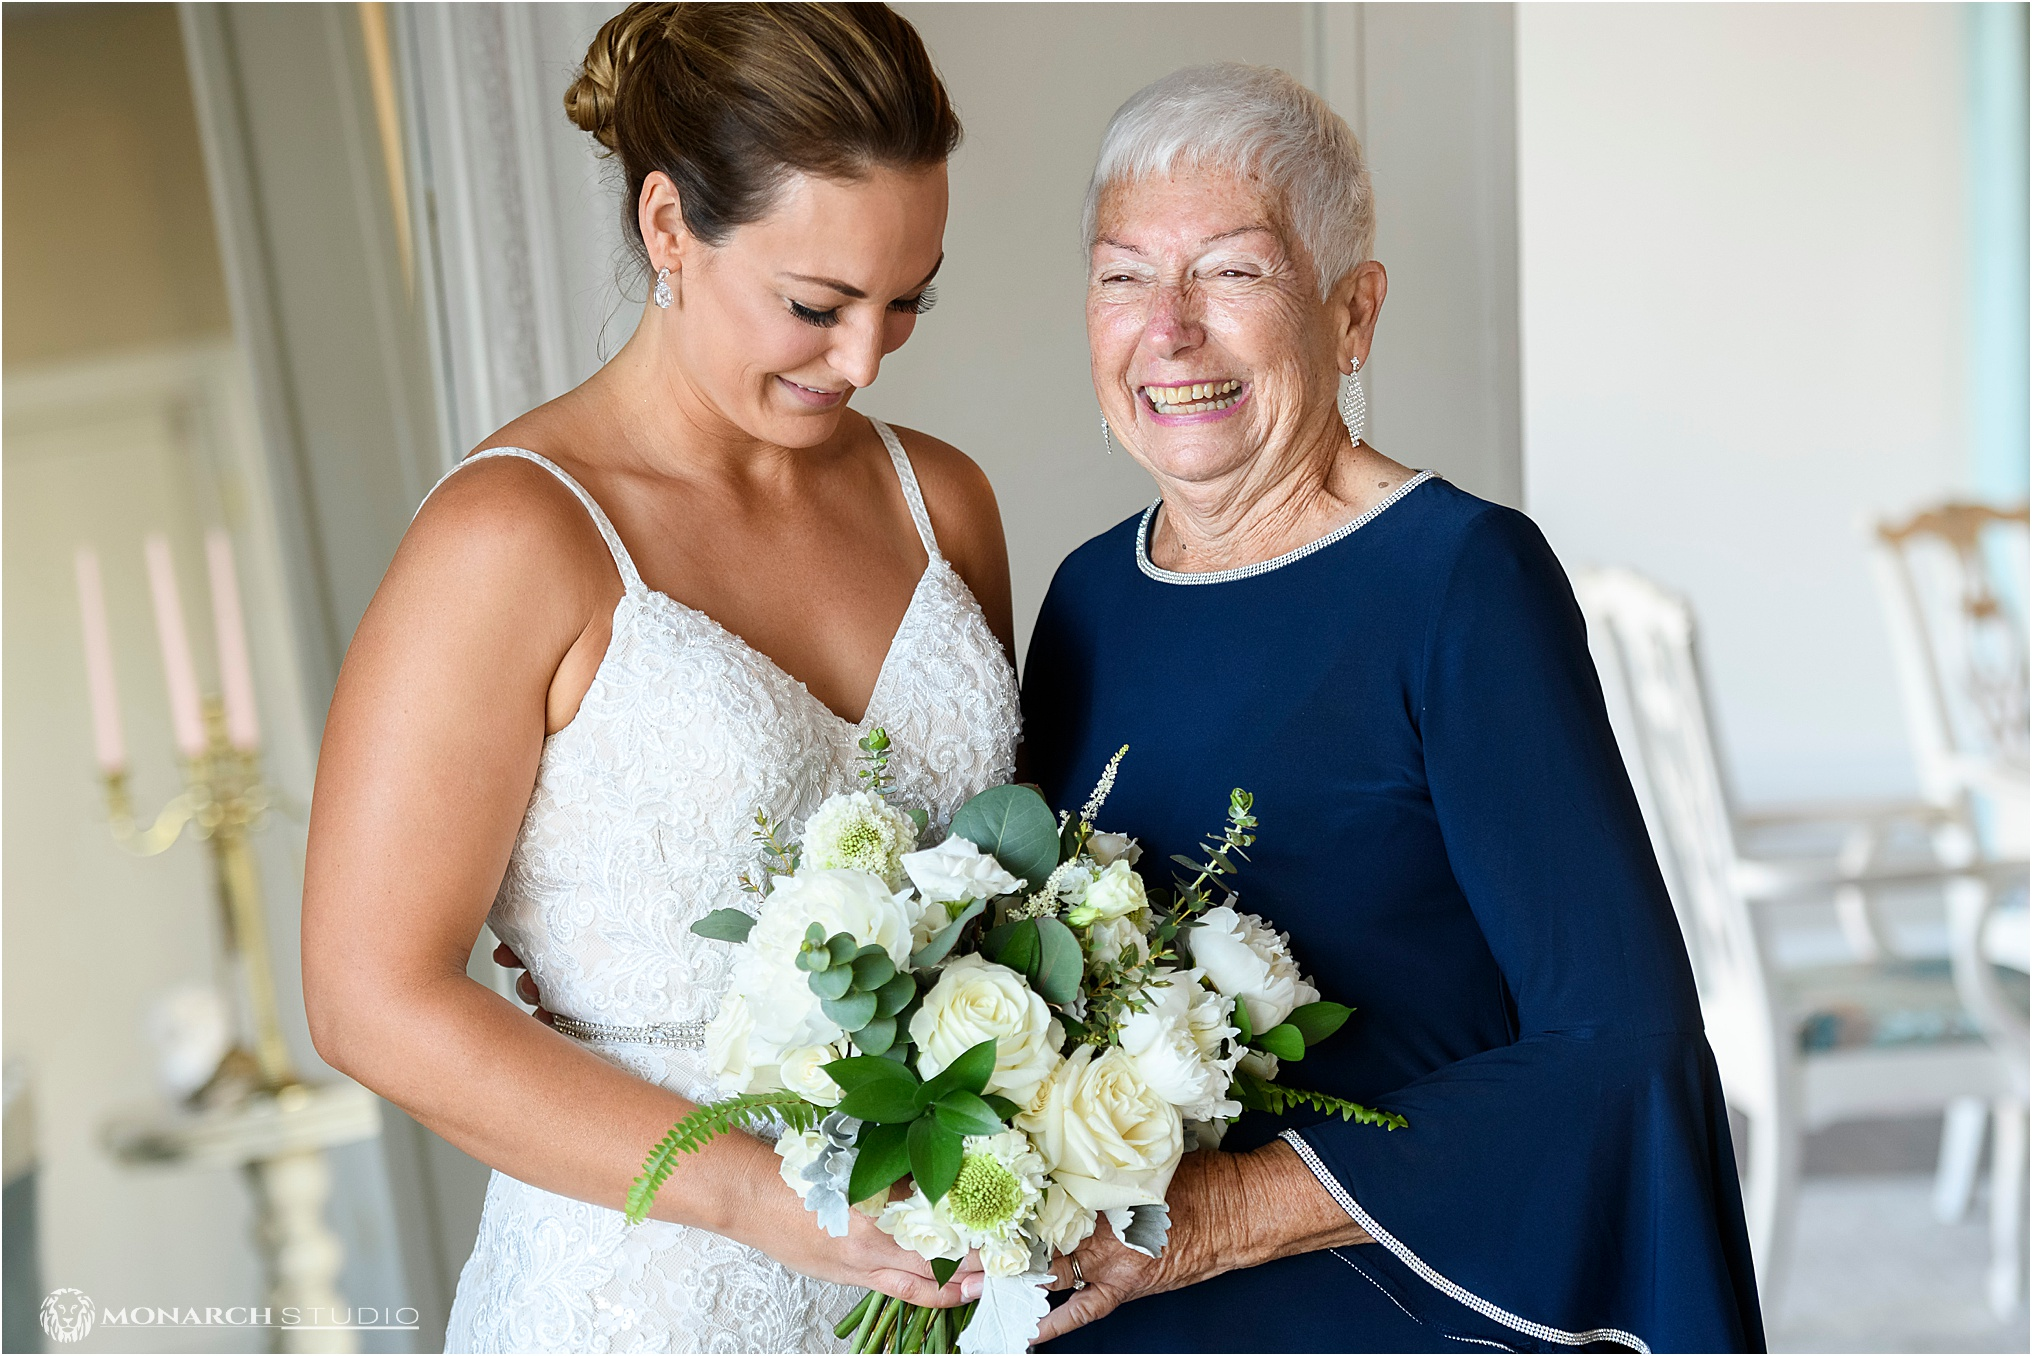 057-whiteroom-wedding-photographer-2019-05-22_0039.jpg